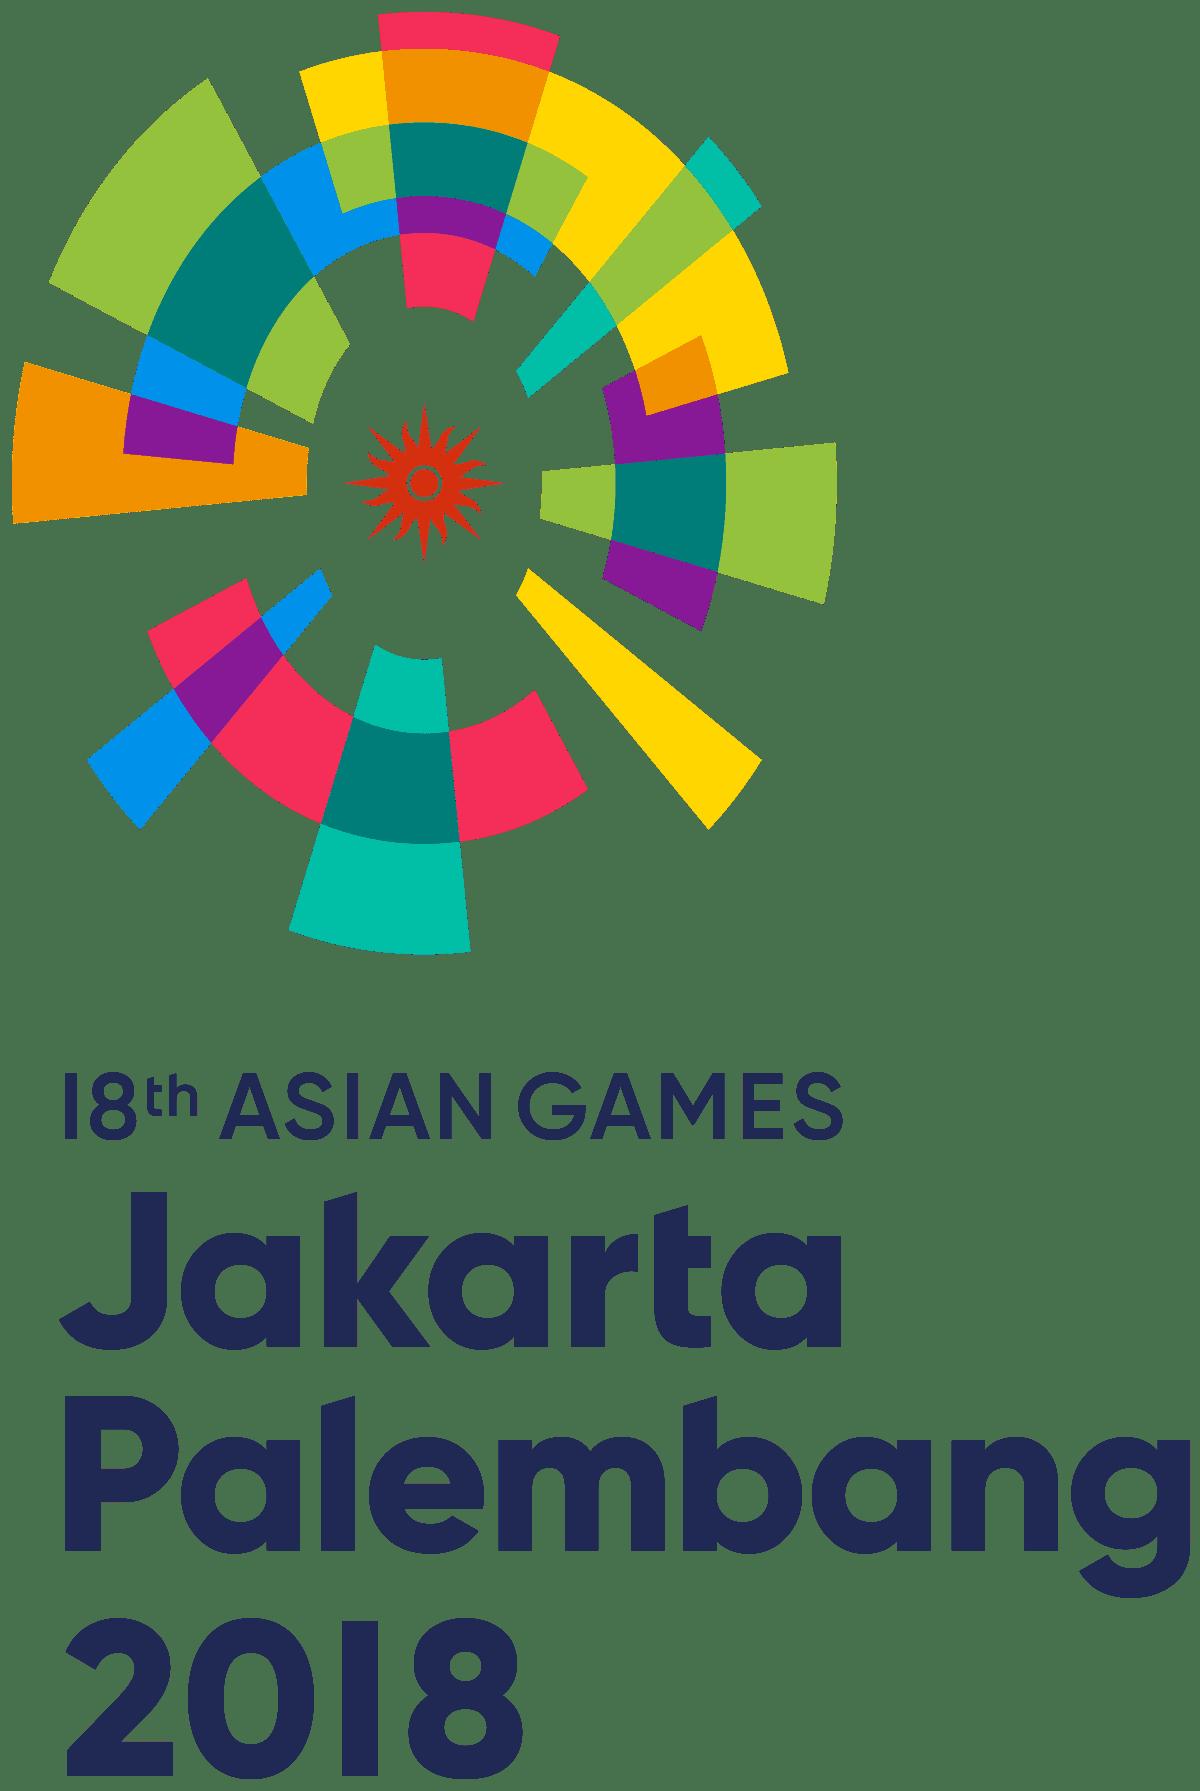 2018_Asian_Games_logo.svg.png